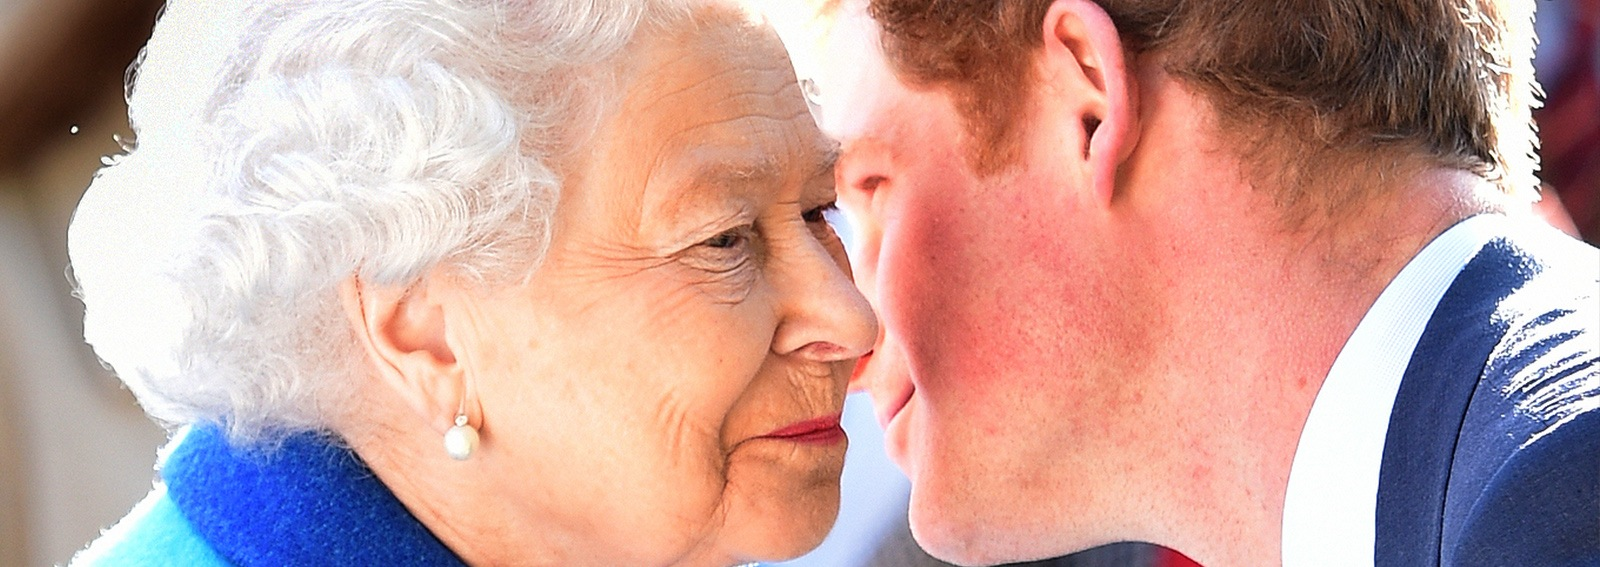 cover principe harry permesso regina sposarsi desktop